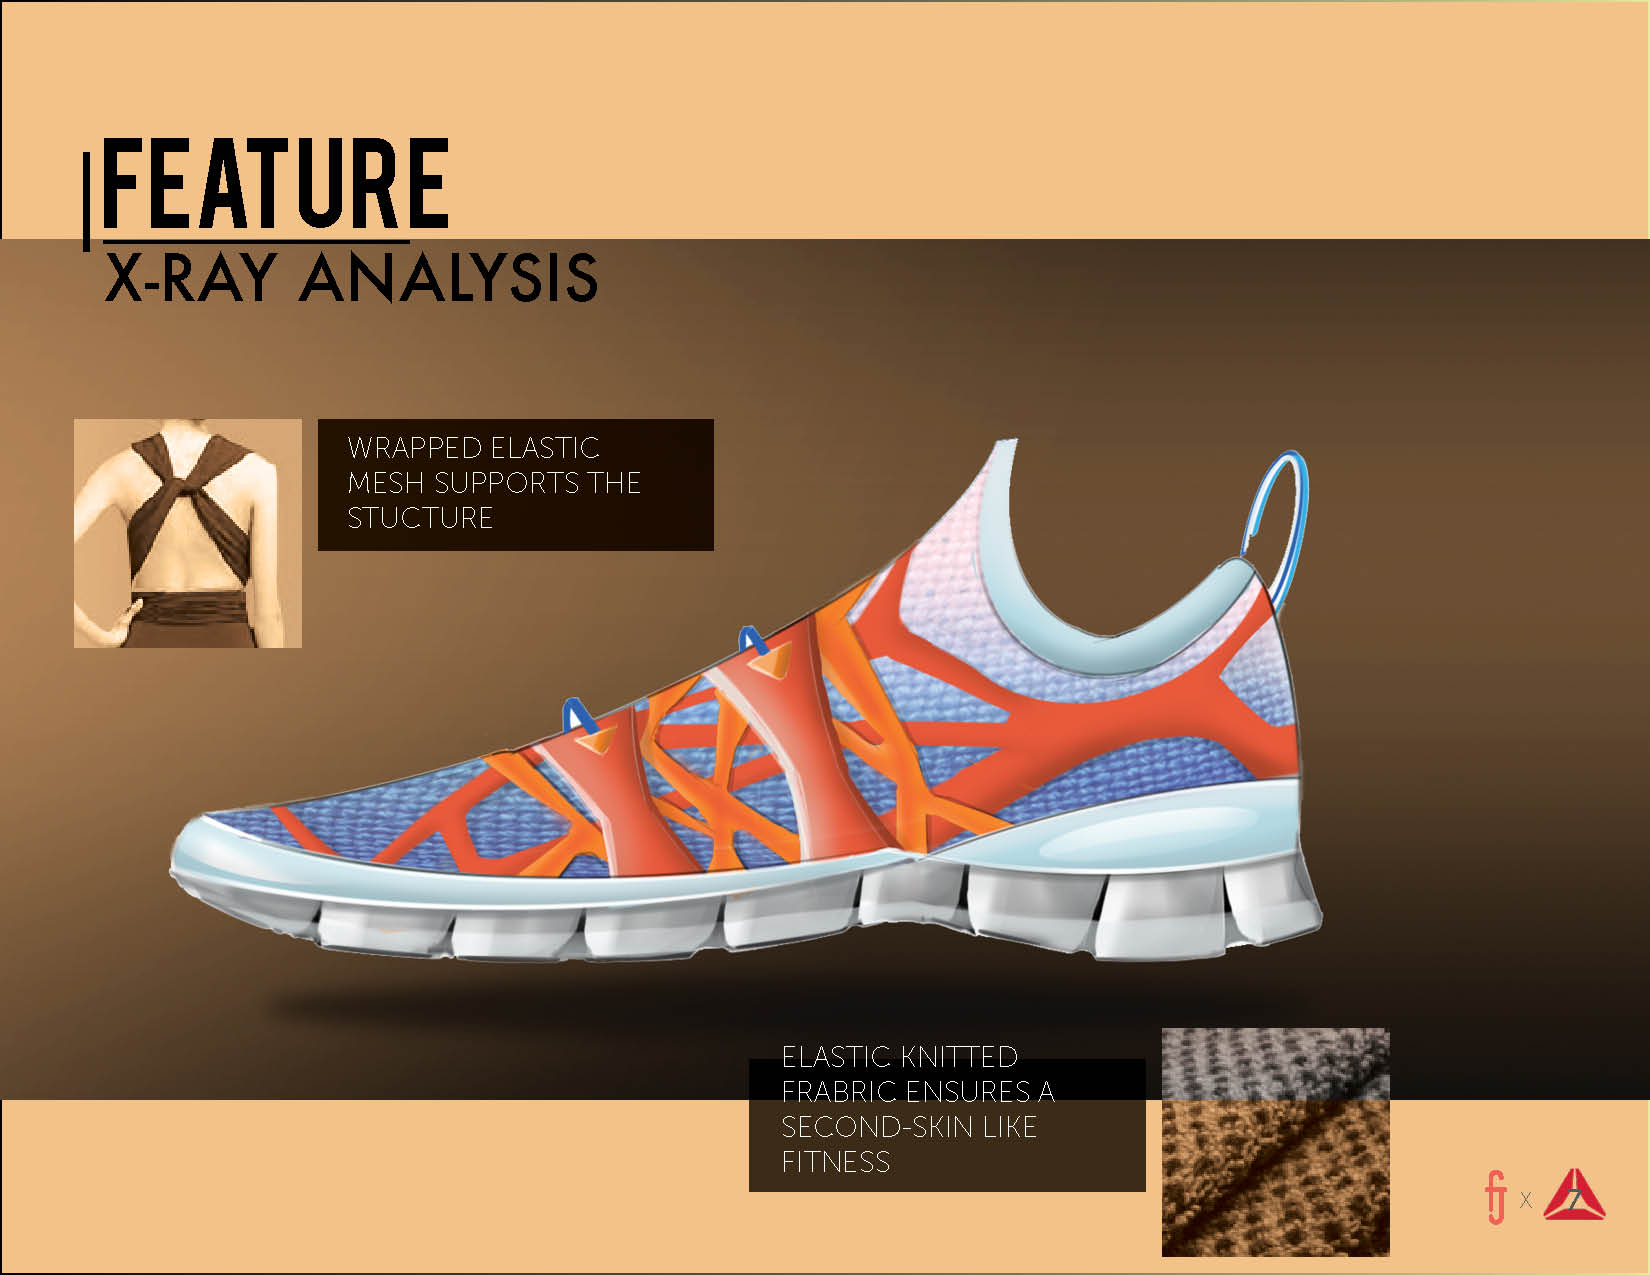 Fujie_Zong_Footwear_Internship_Application7.jpg